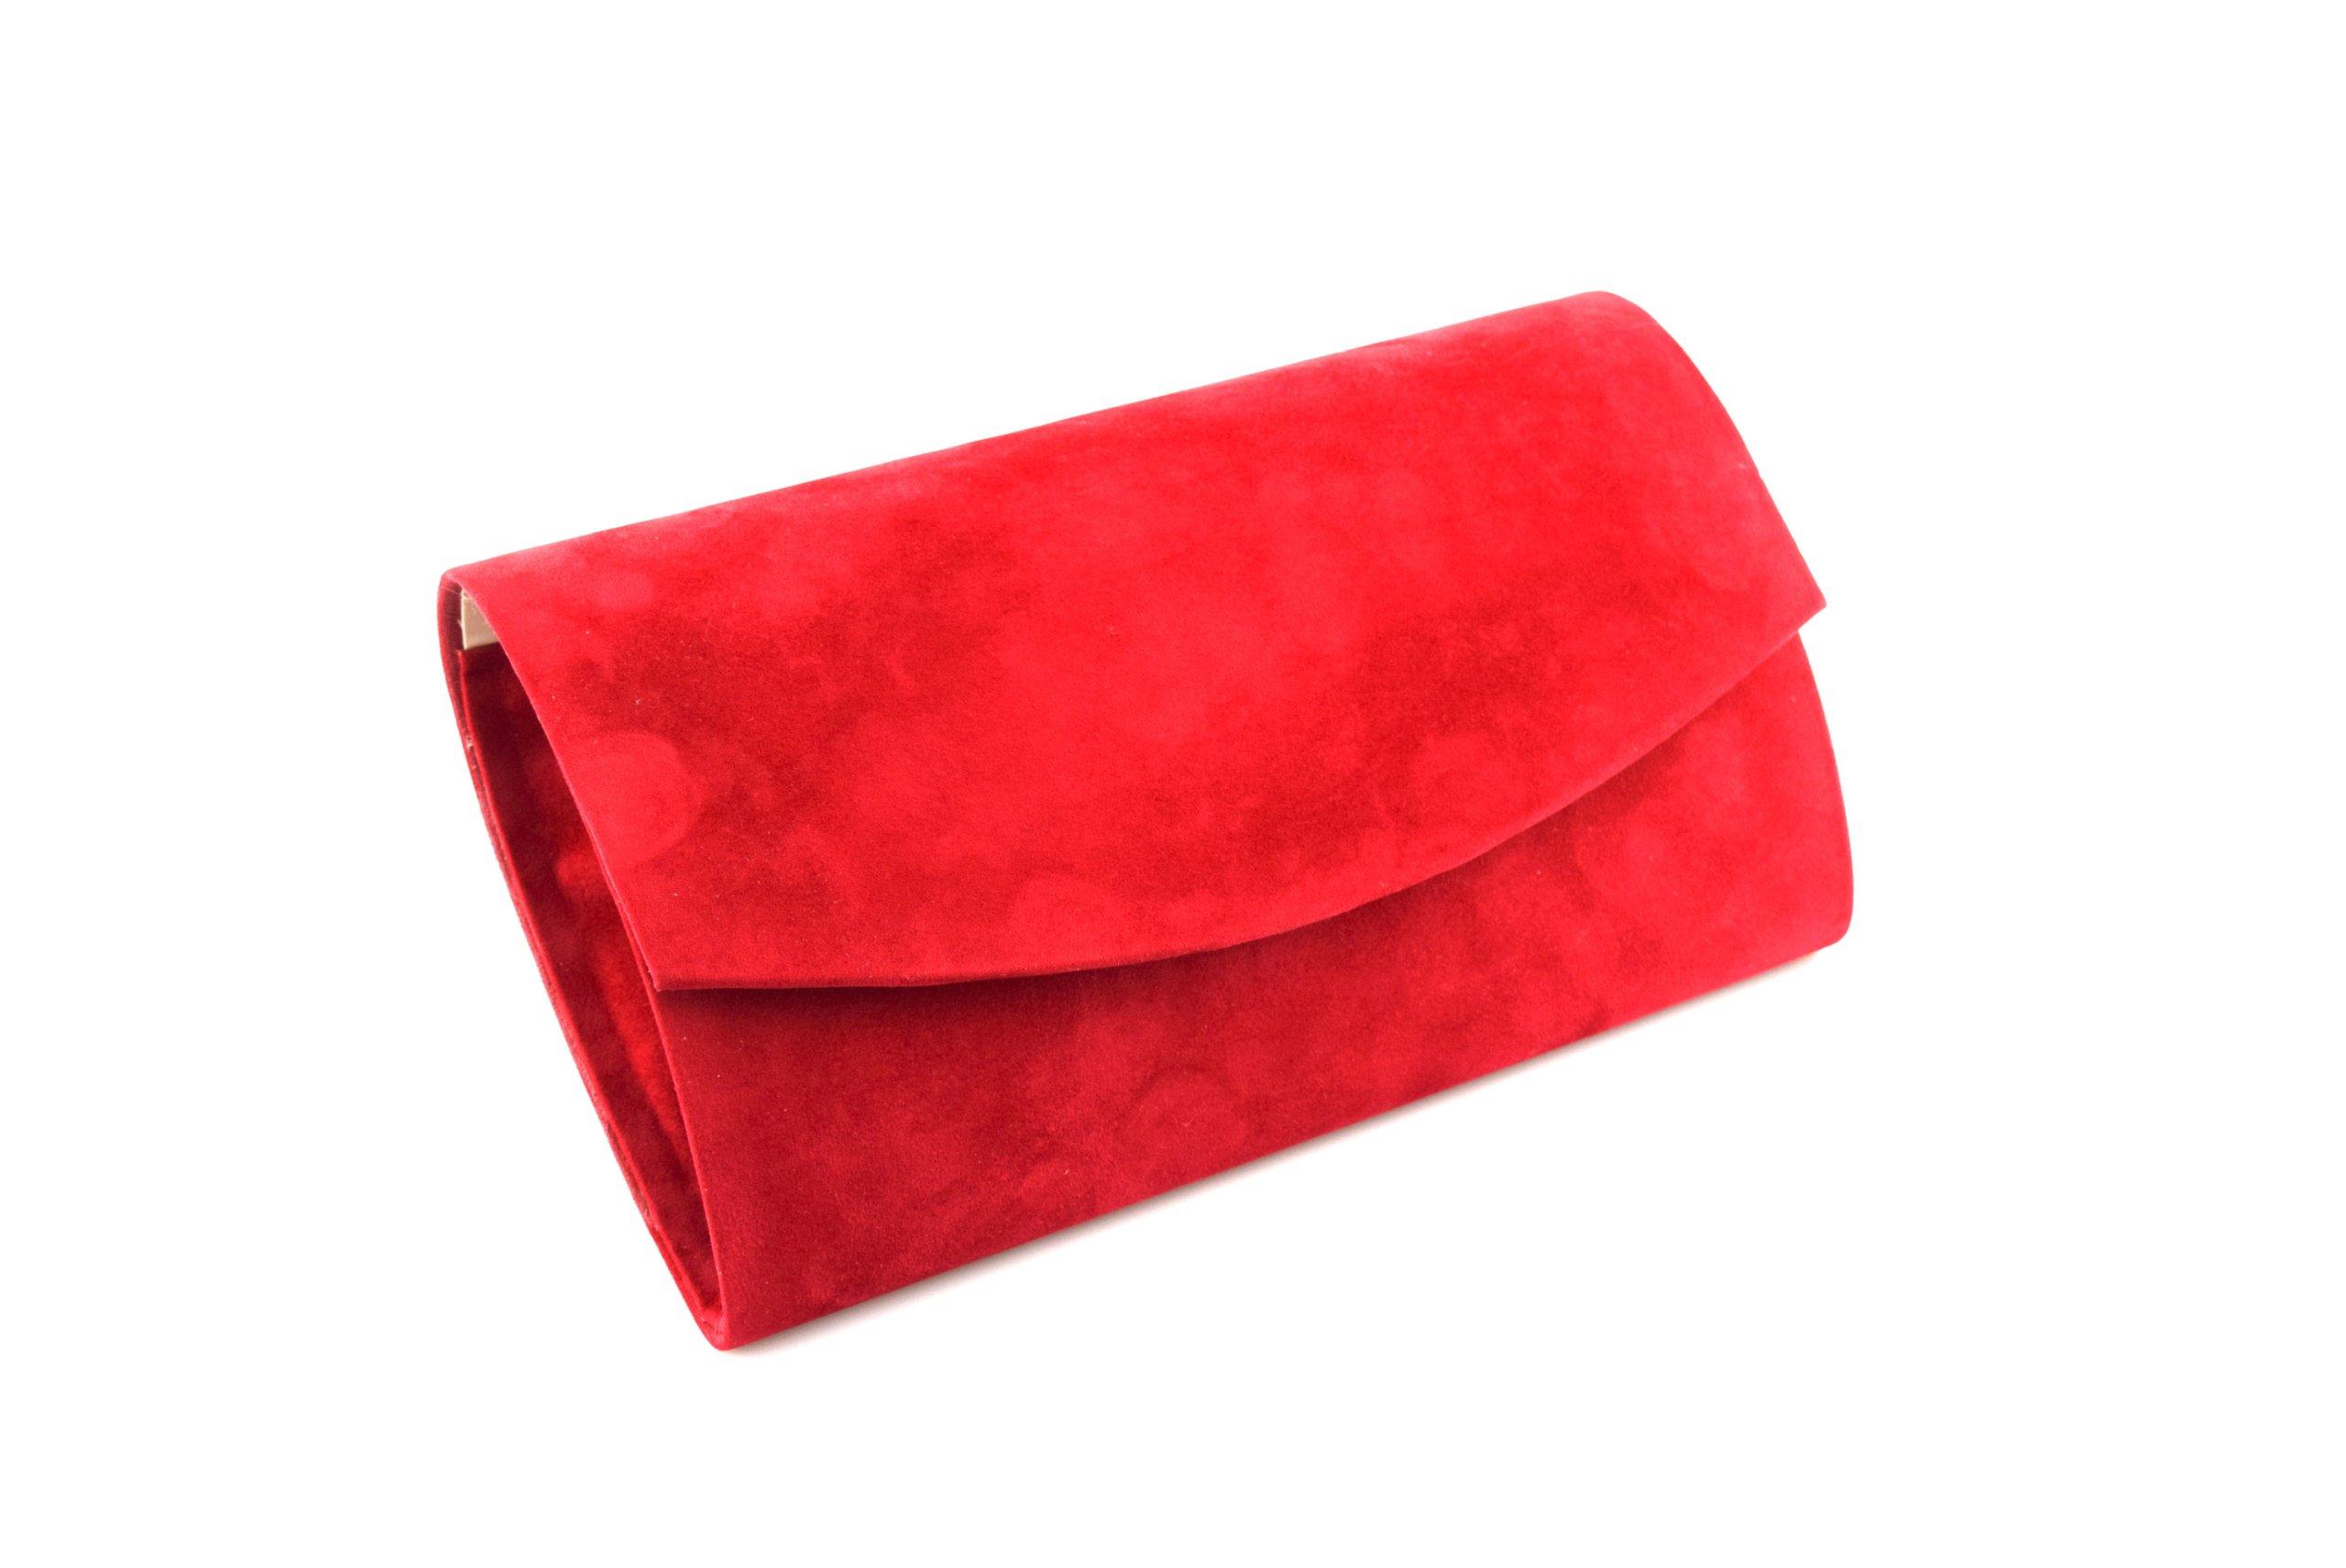 1e5e246b0edda Czerwona damska torebka kopertówka LaModa S3 zamsz 6898632250 - Allegro.pl